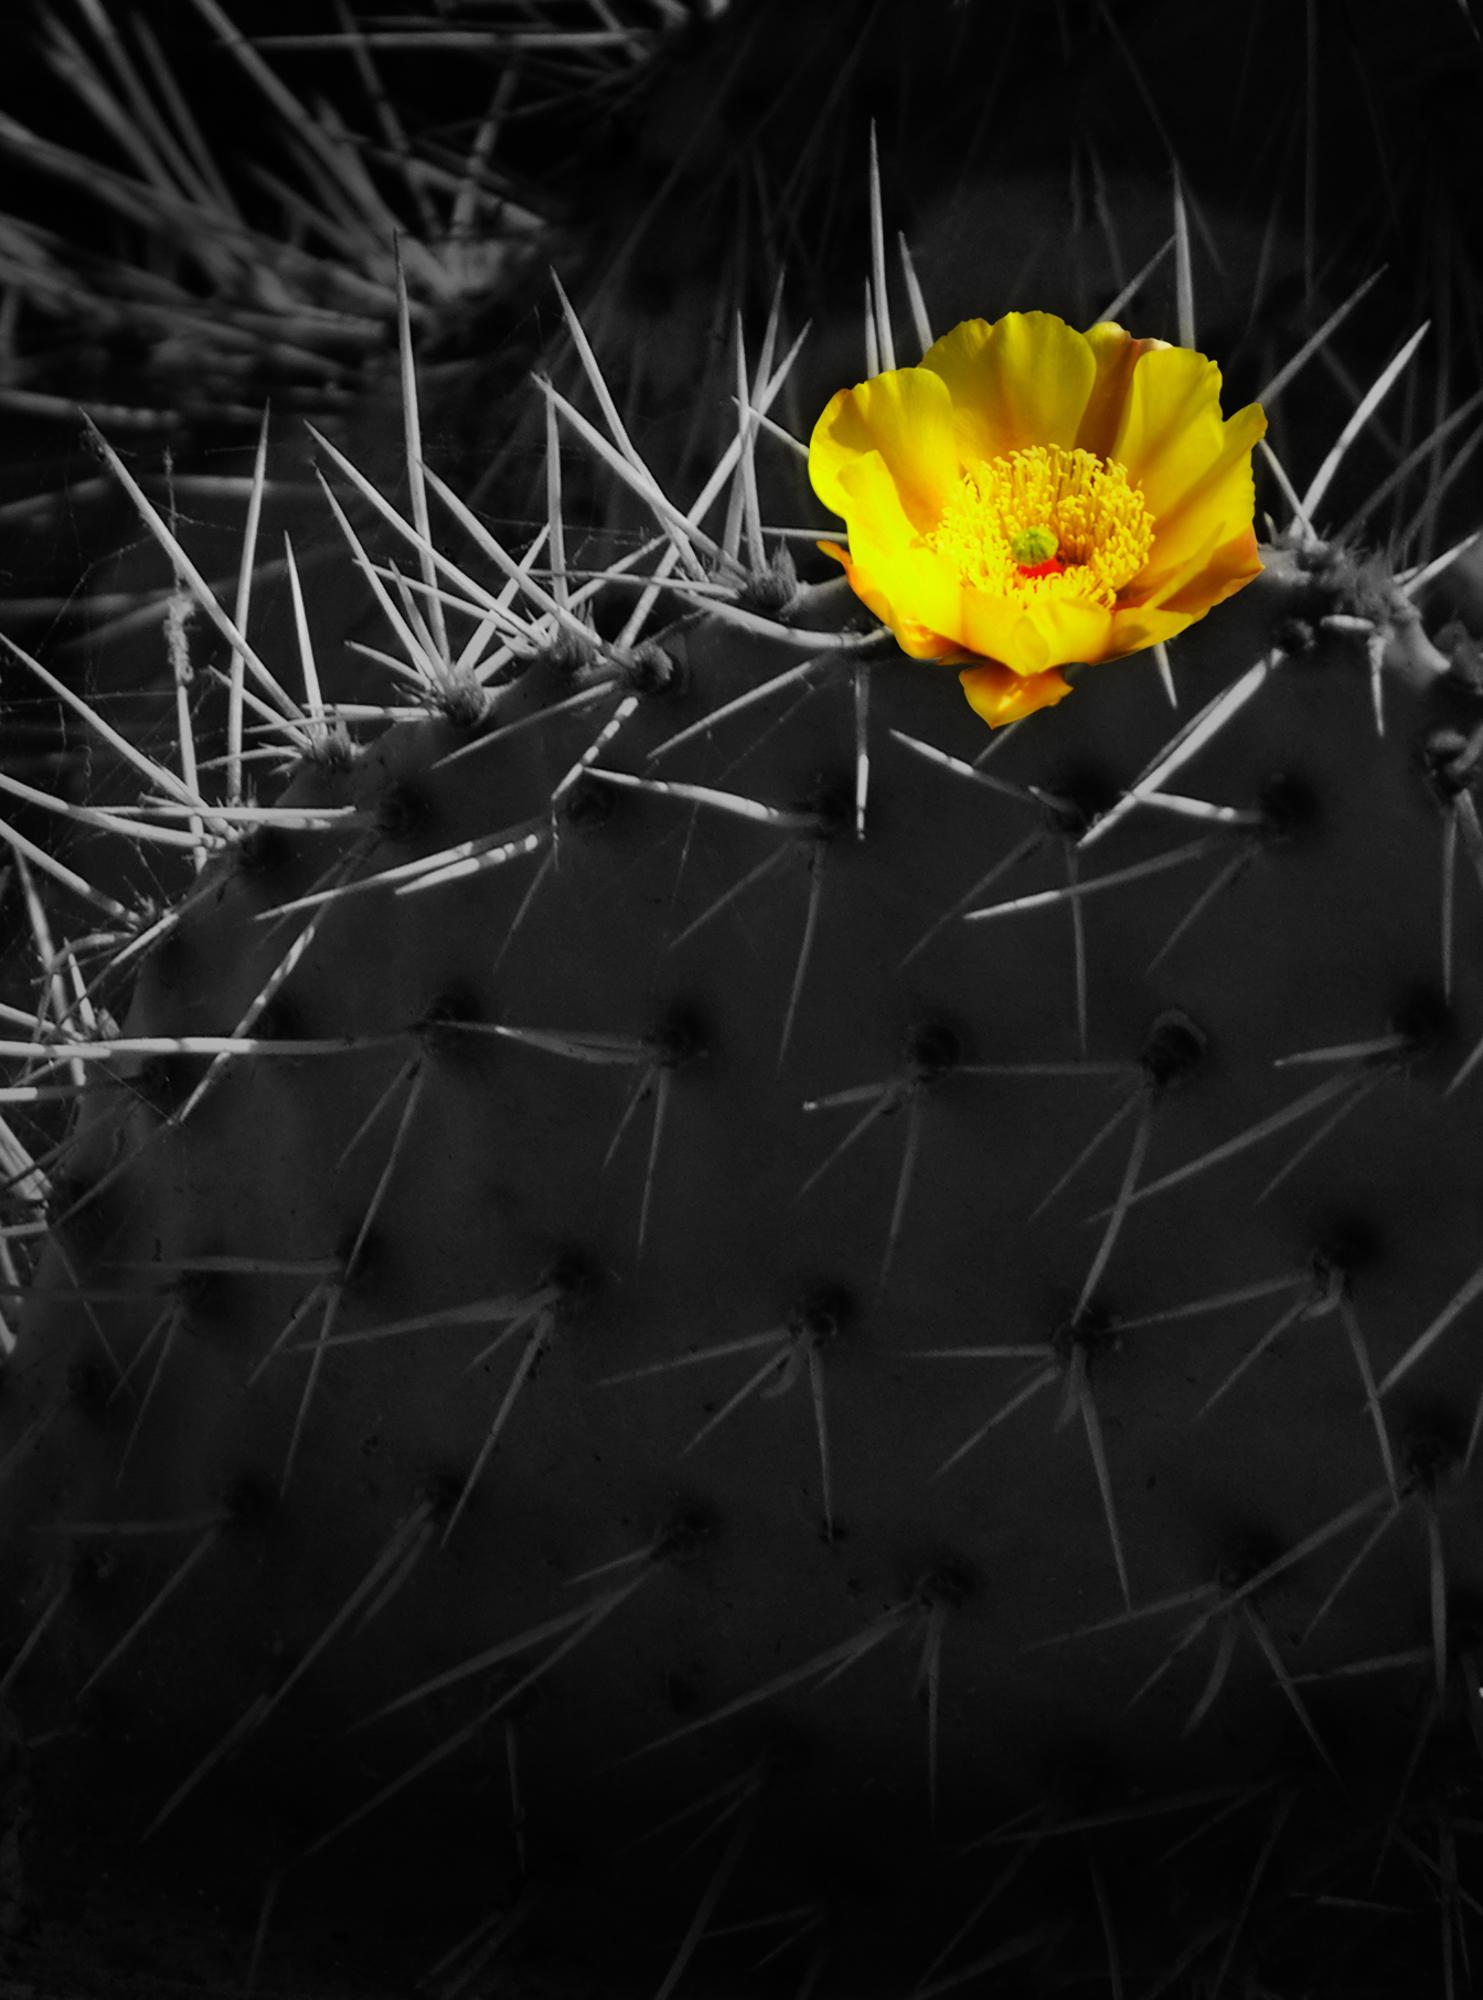 CactusFlower2